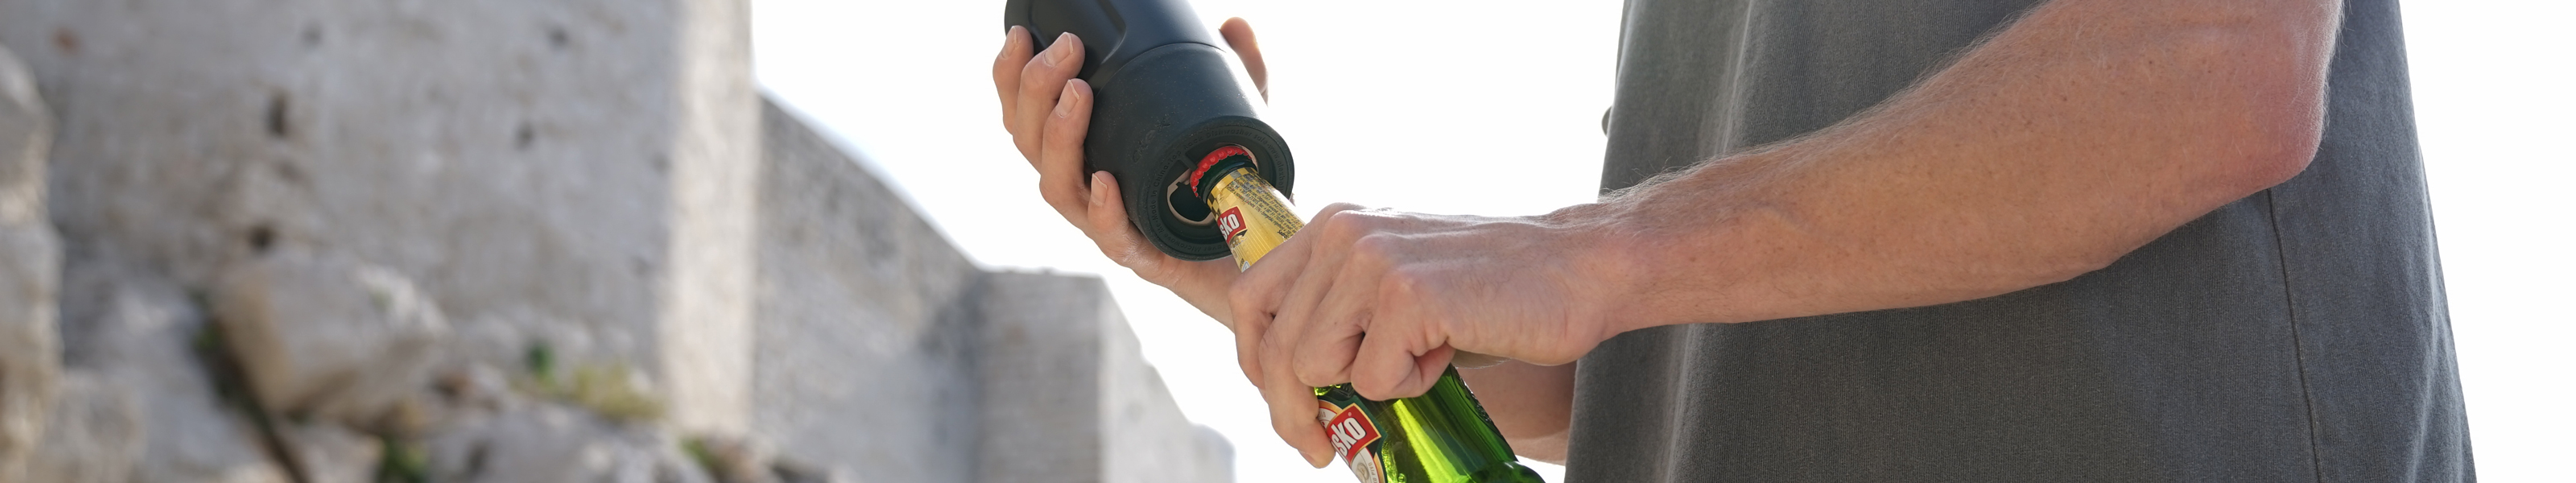 Header1708 bottlebottom.jpg?ixlib=rails 2.1